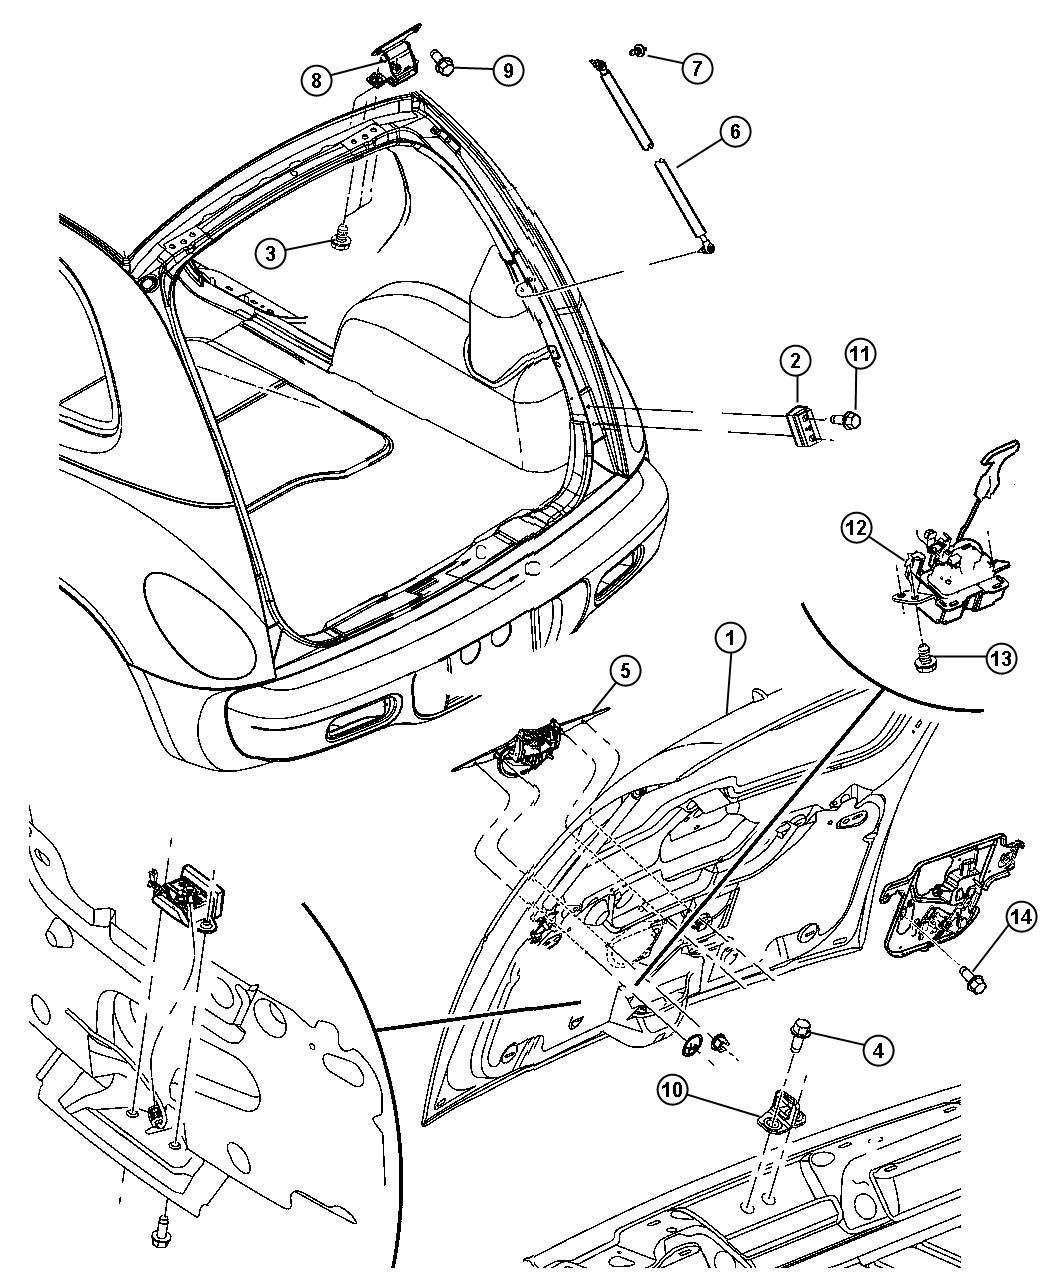 2006 chrysler pt cruiser parts catalog subaru forester wiring diagram 2002 at ww freeautoresponder